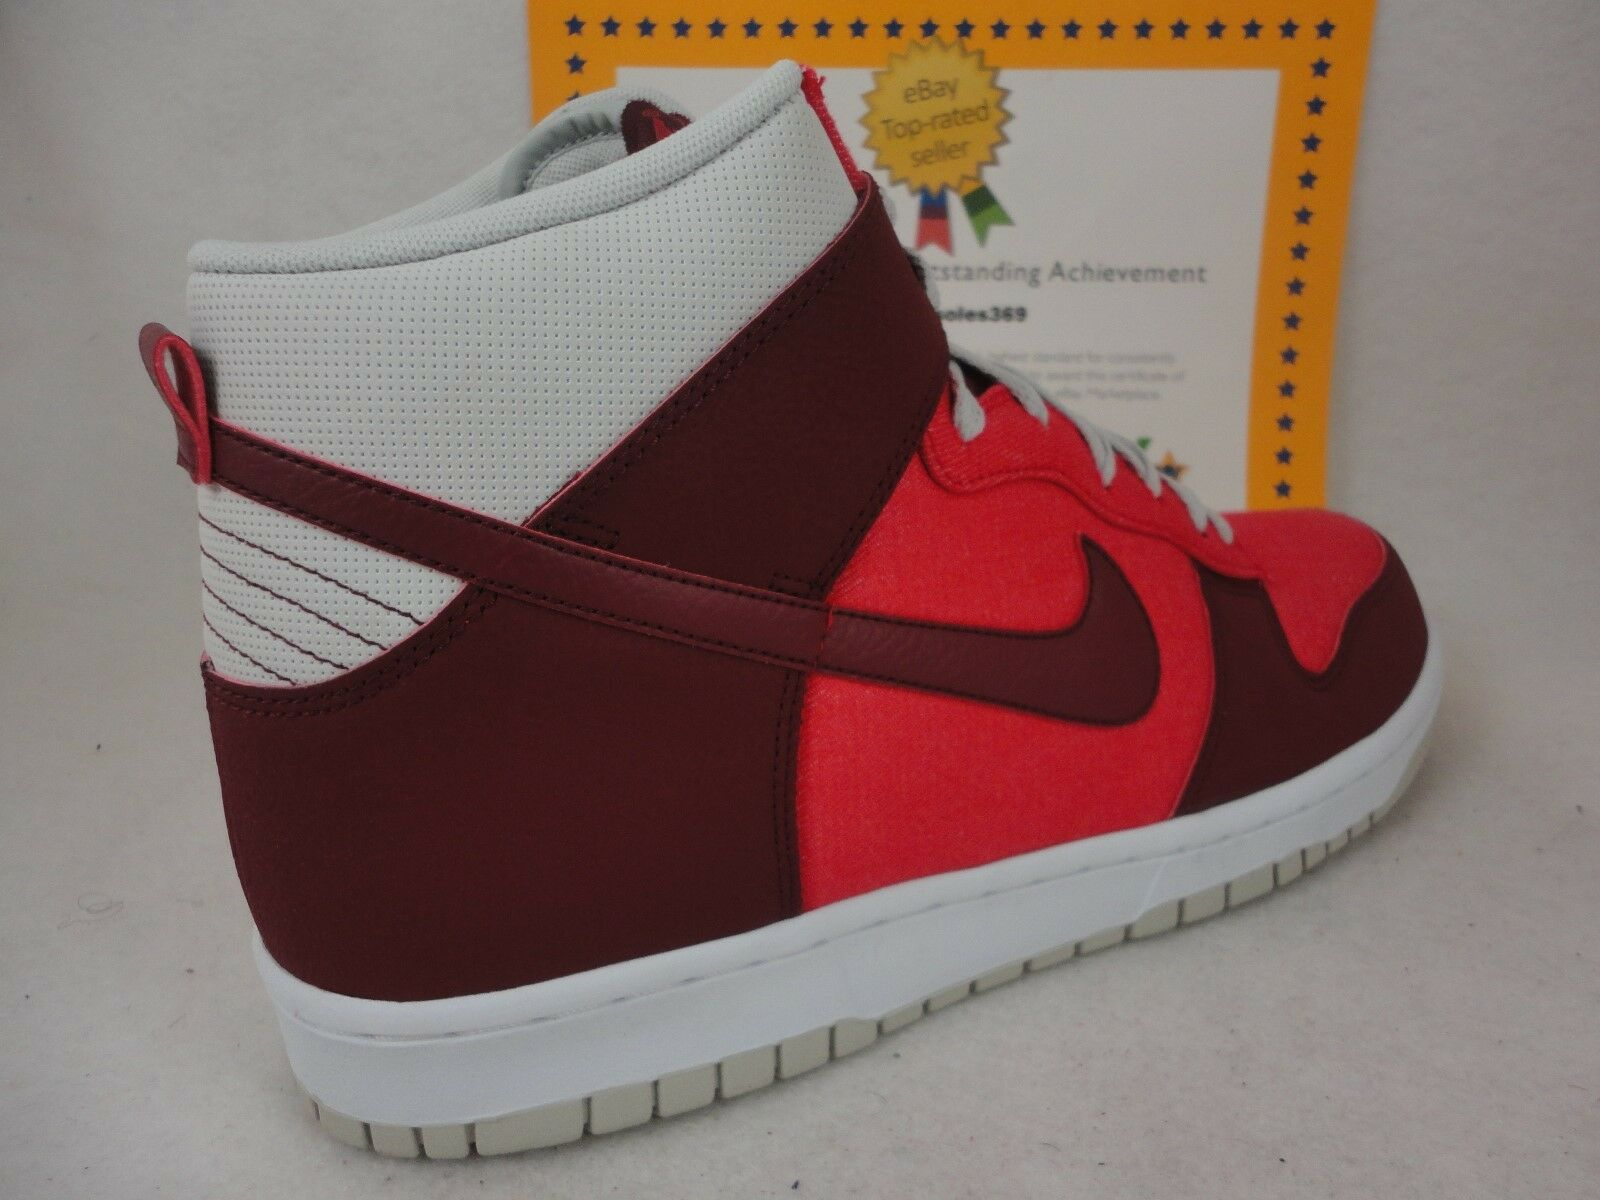 Nike Dunk High, Team 2012, Hyper Red / Team High, Red / Grey, 317982 612, Sz 12 5184b0